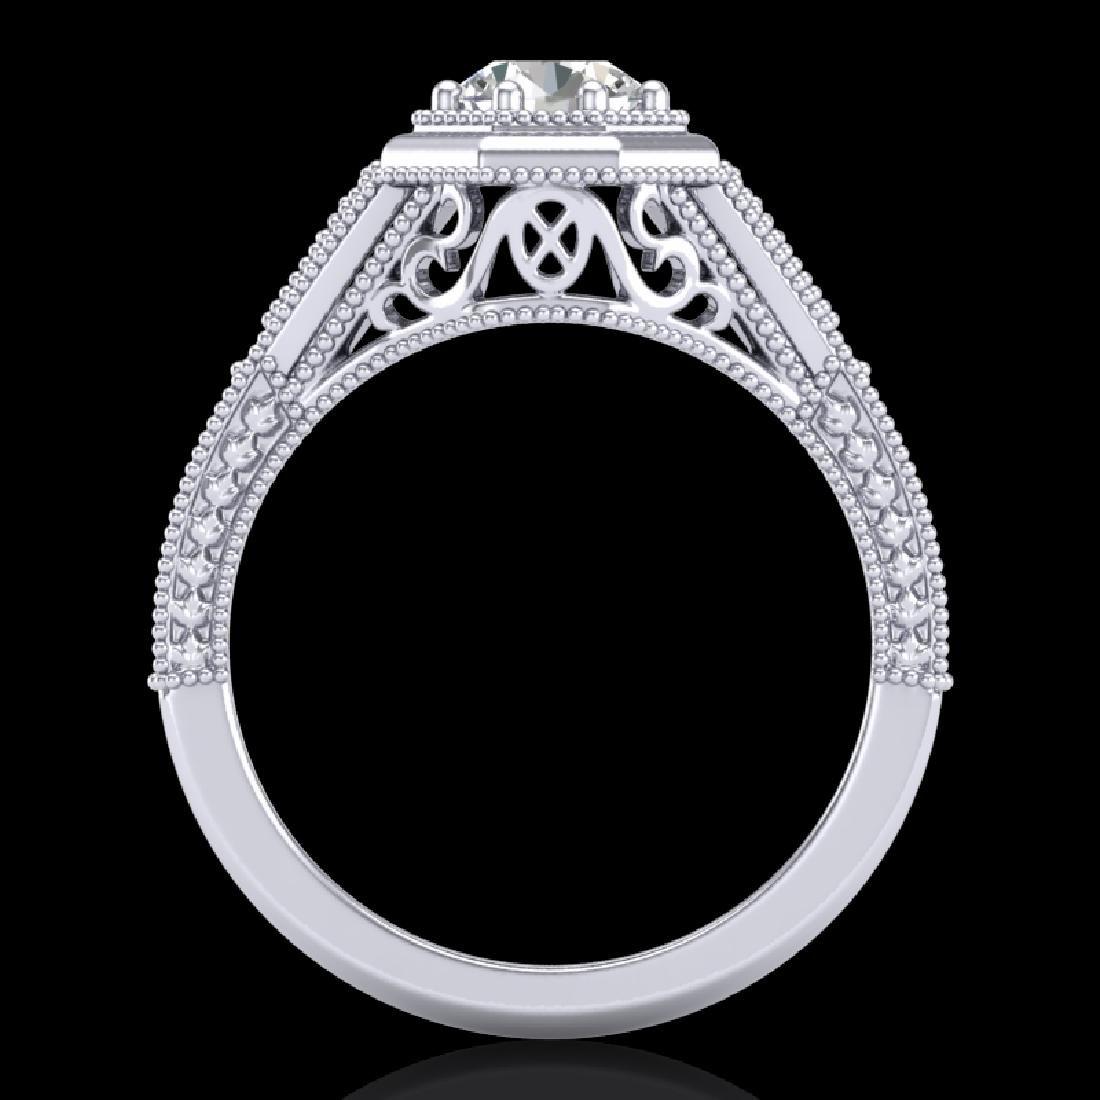 0.84 CTW VS/SI Diamond Solitaire Art Deco Ring 18K